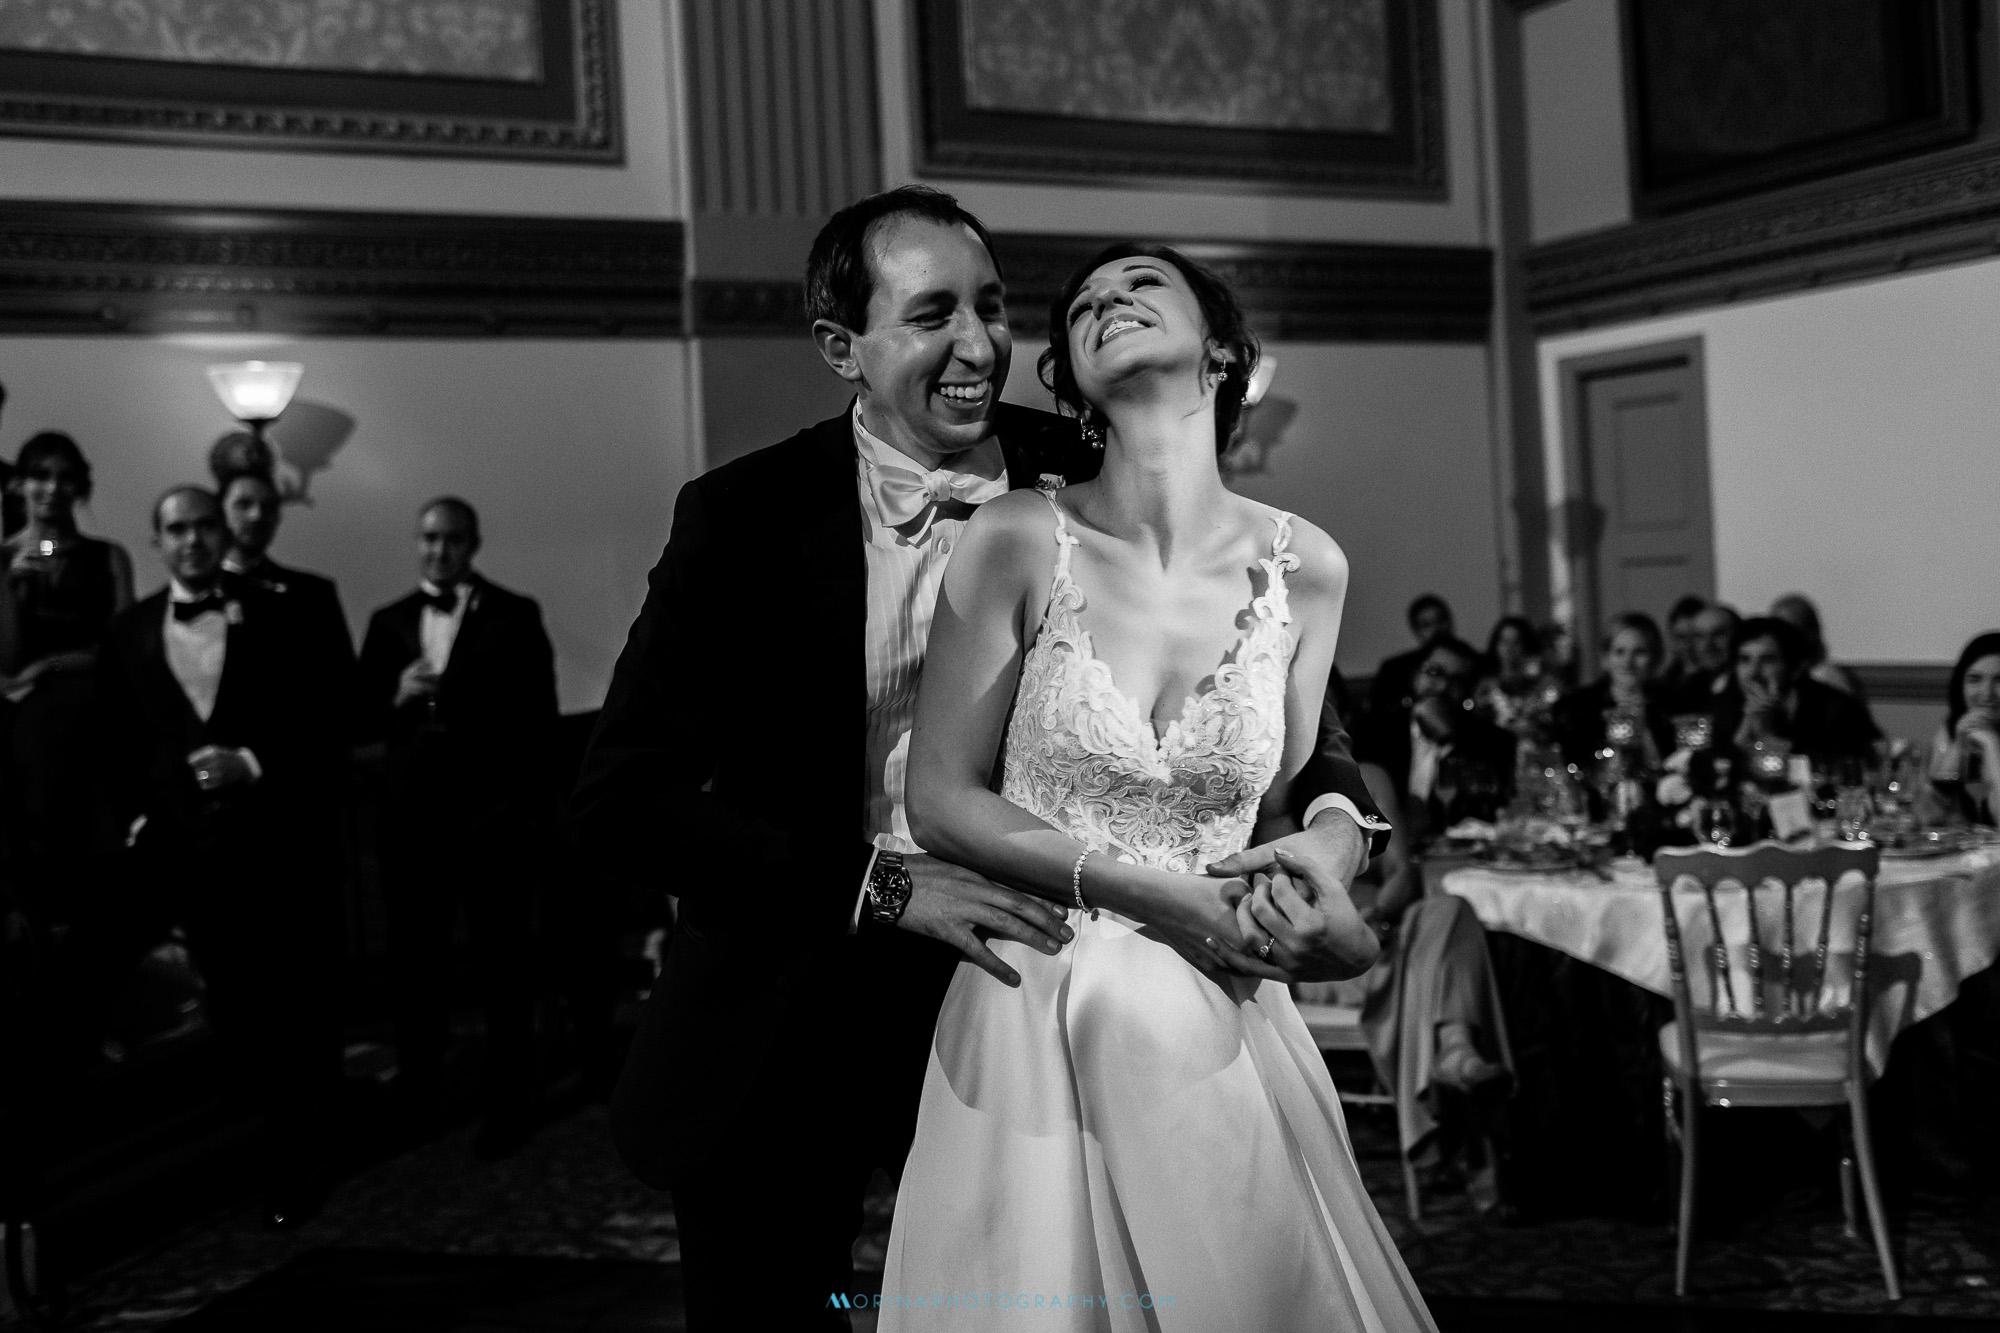 Ilhana & Jonathan Wedding at Vault 634 - Allentown 0062.jpg